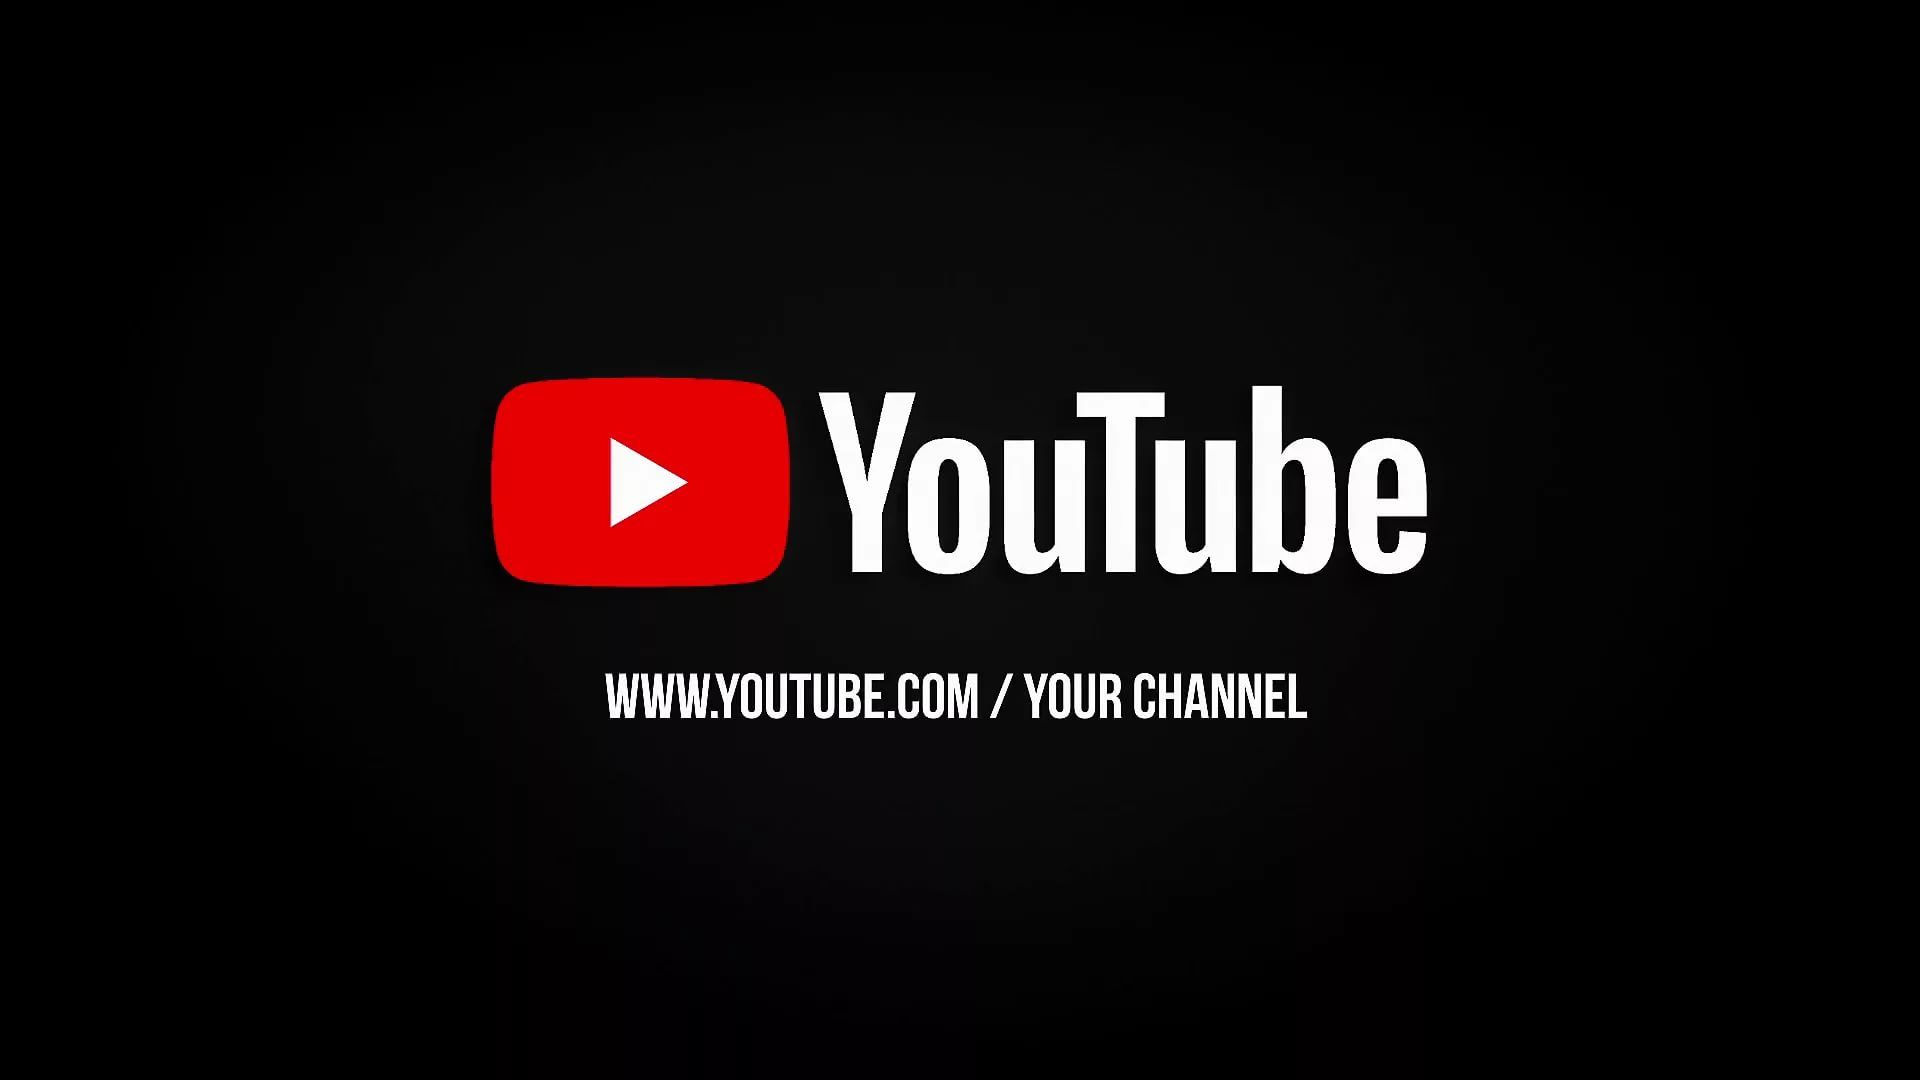 Youtube 1080p Wallpaper